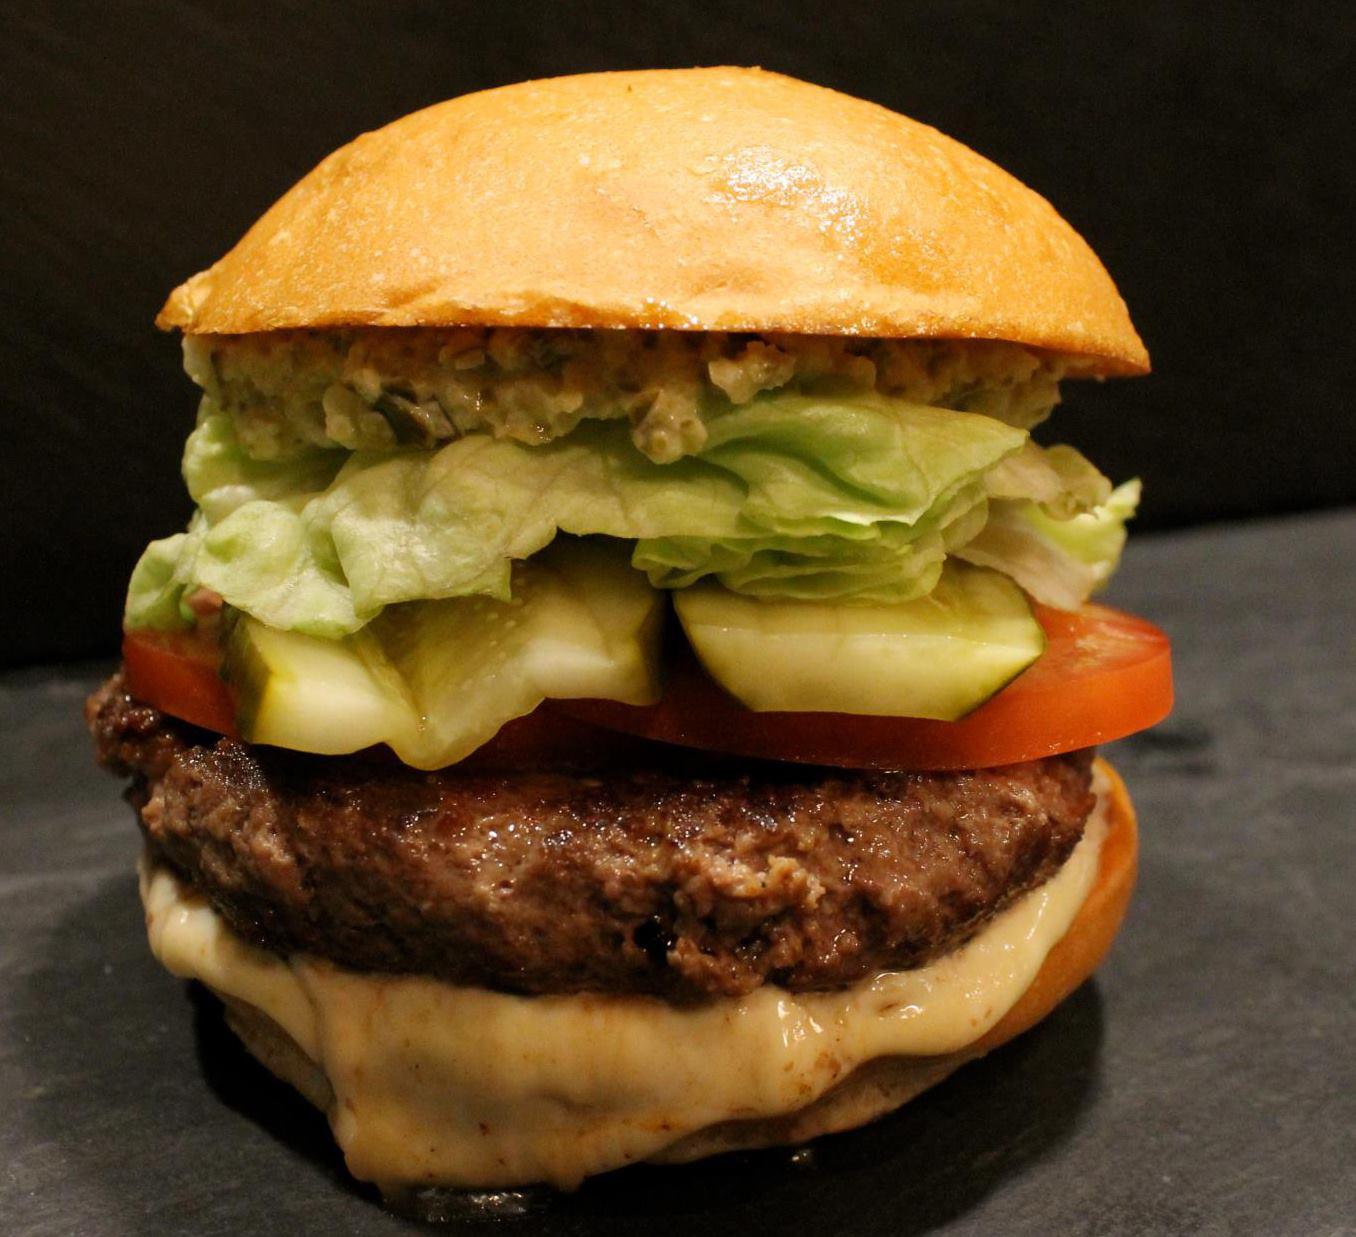 2013-07-01-JuicyLucy_Burger.jpg